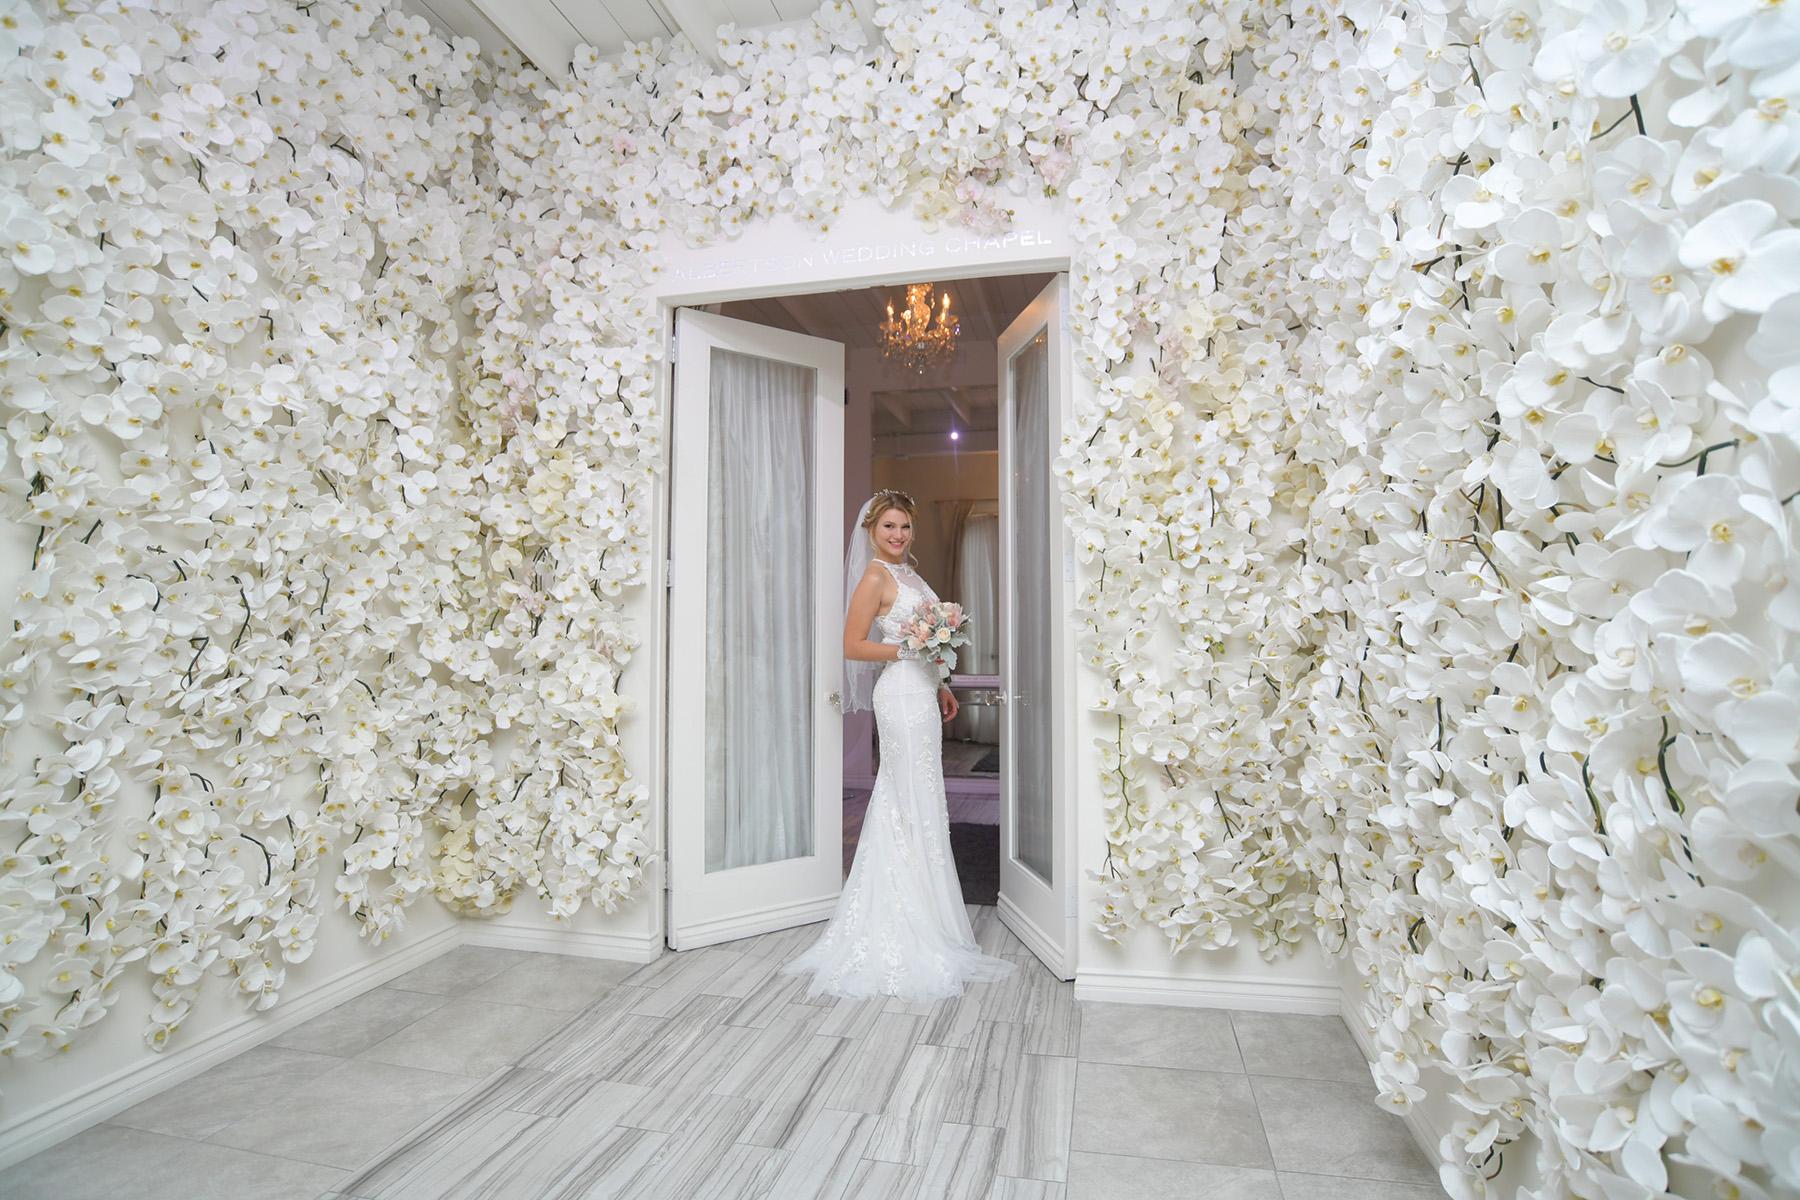 albertson wedding chapel hompage image of interior